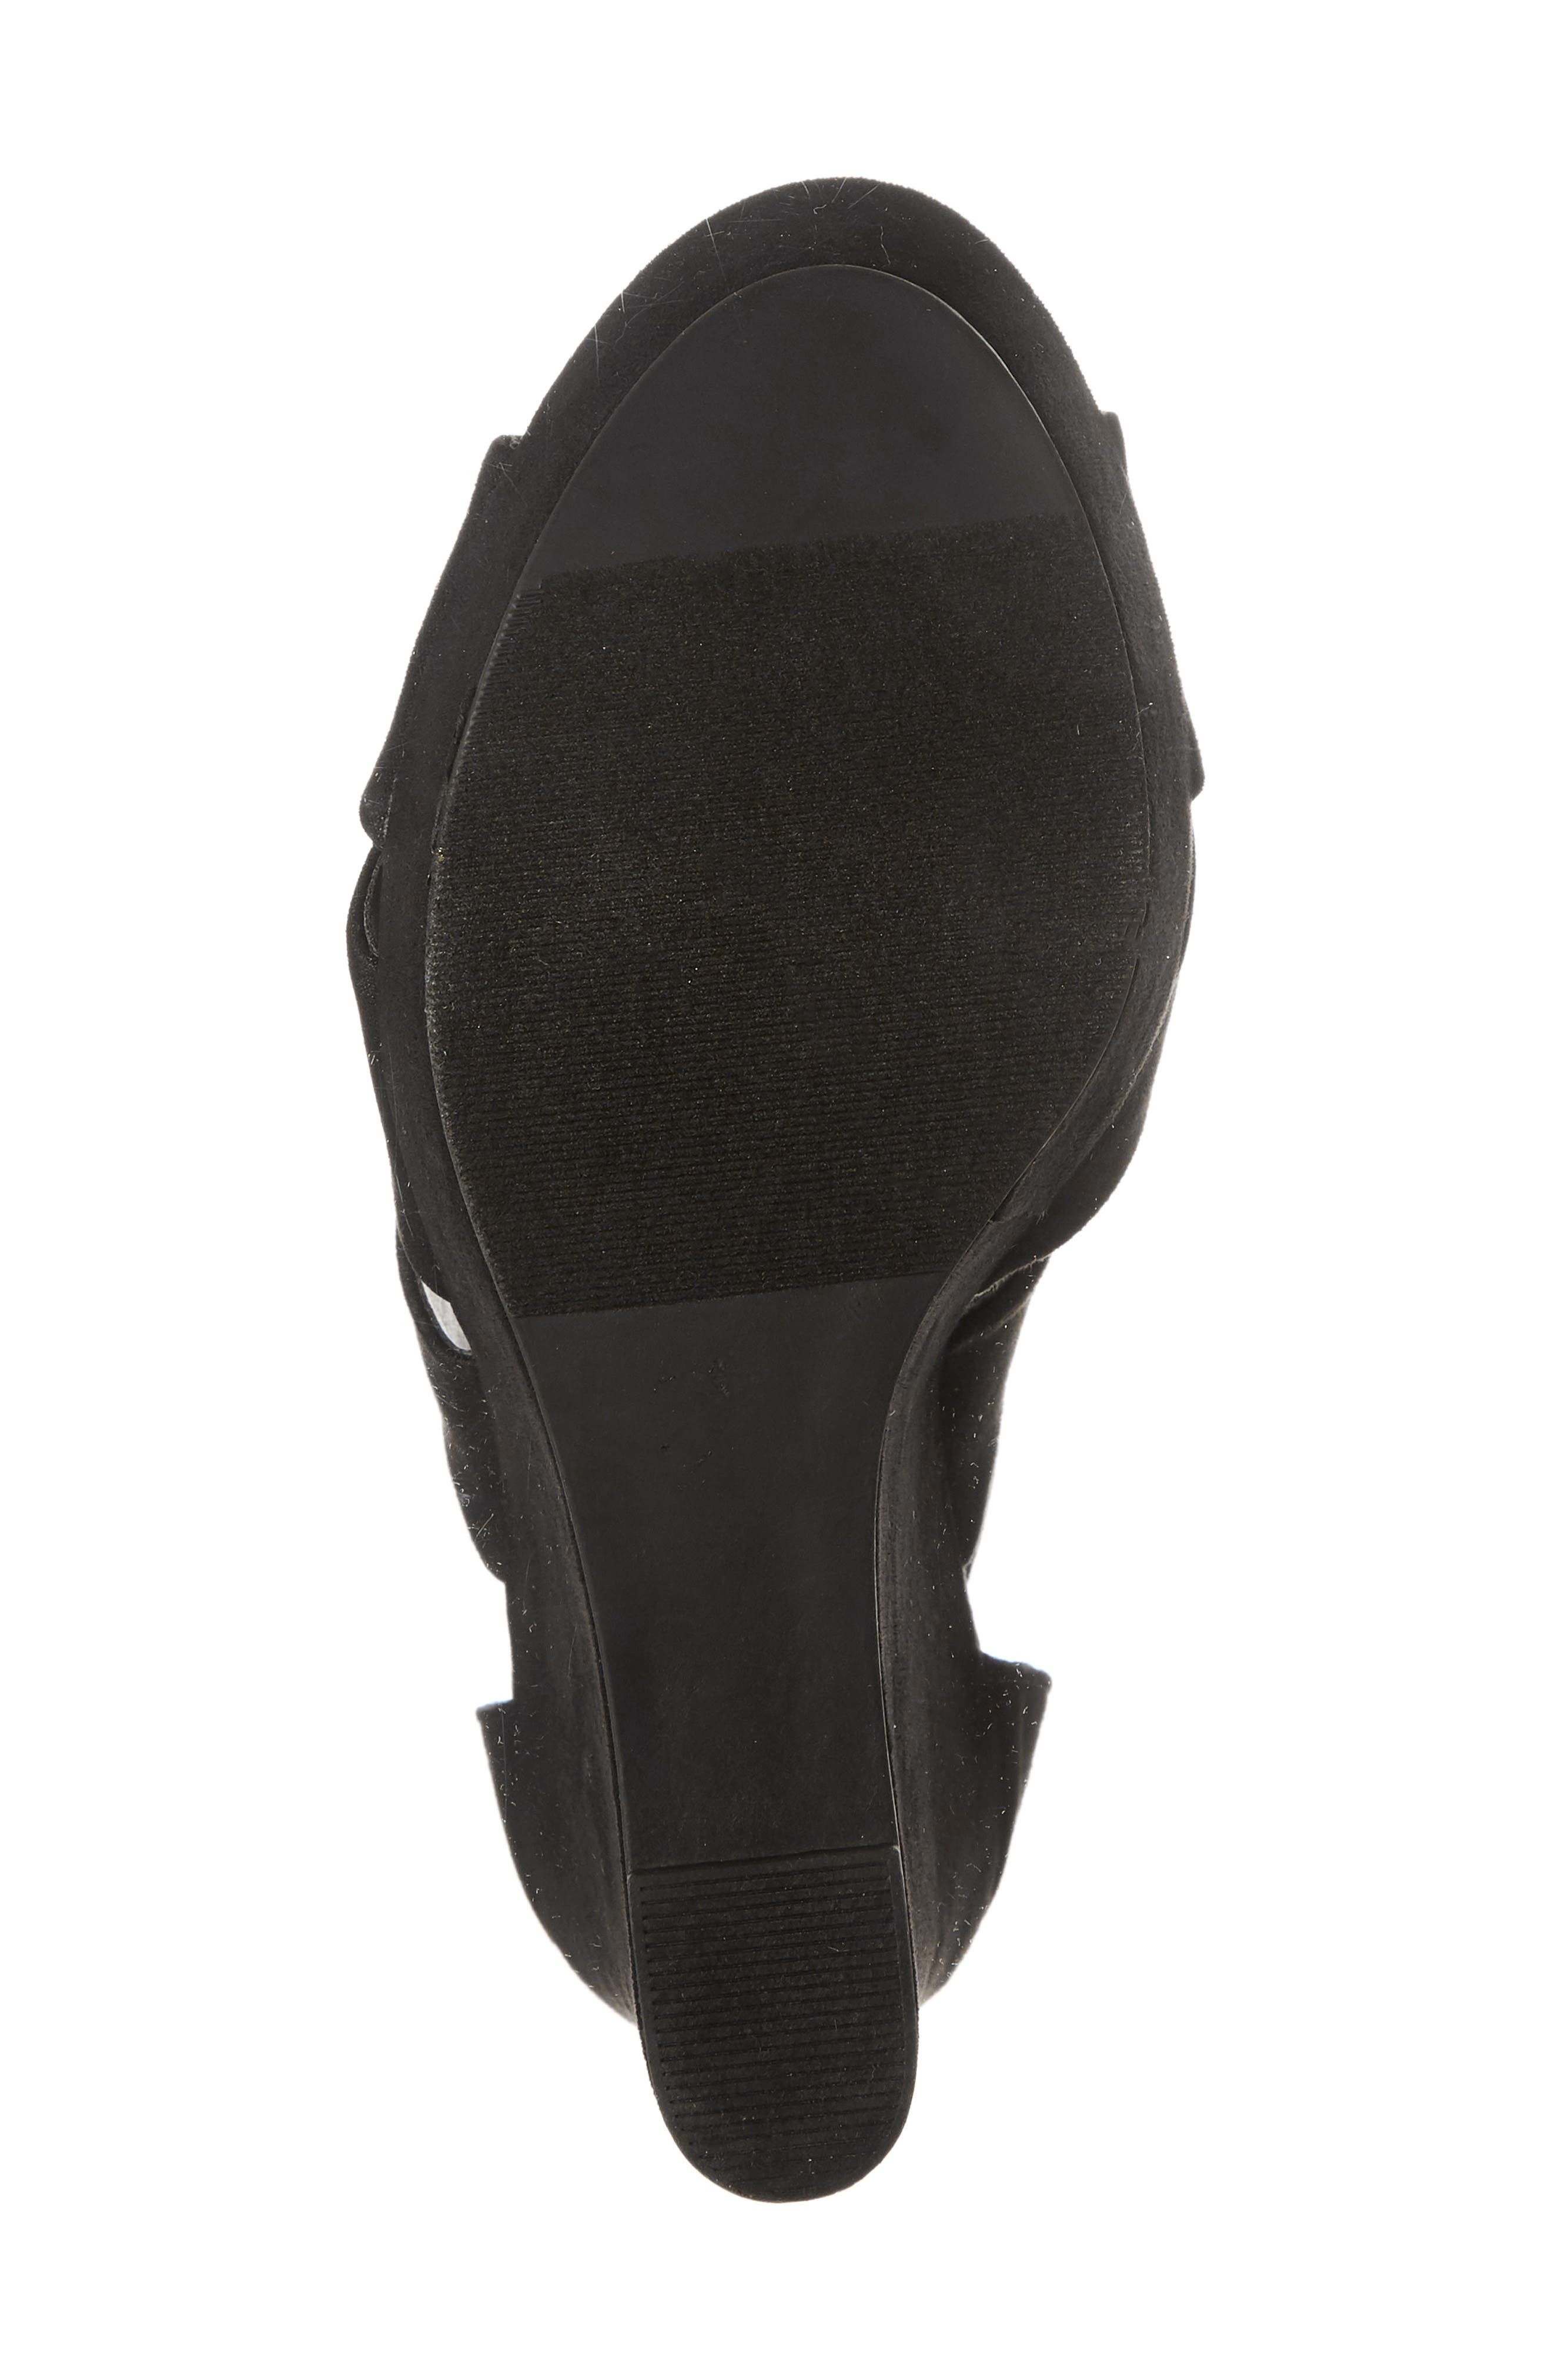 Milani Platform Wedge Sandal,                             Alternate thumbnail 6, color,                             005